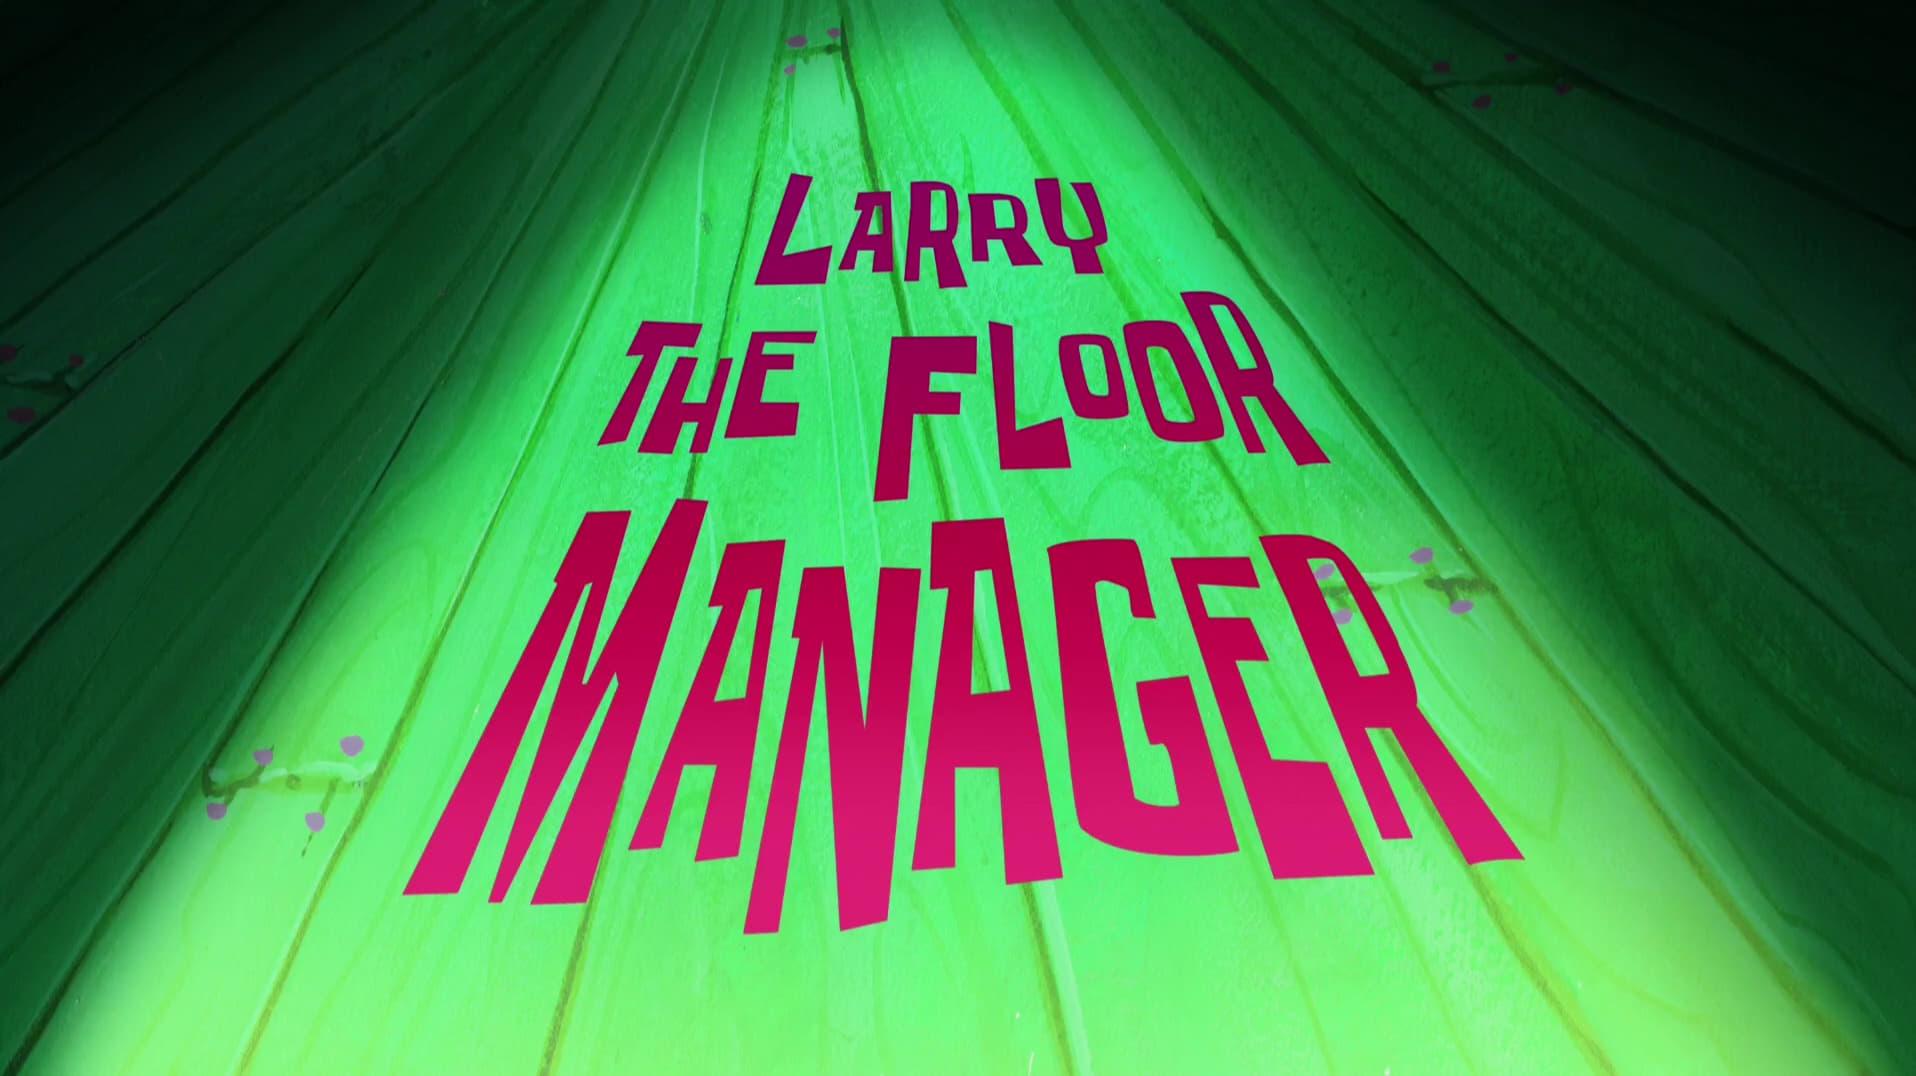 SpongeBob SquarePants - Season 11 Episode 8 : Larry the Floor Manager